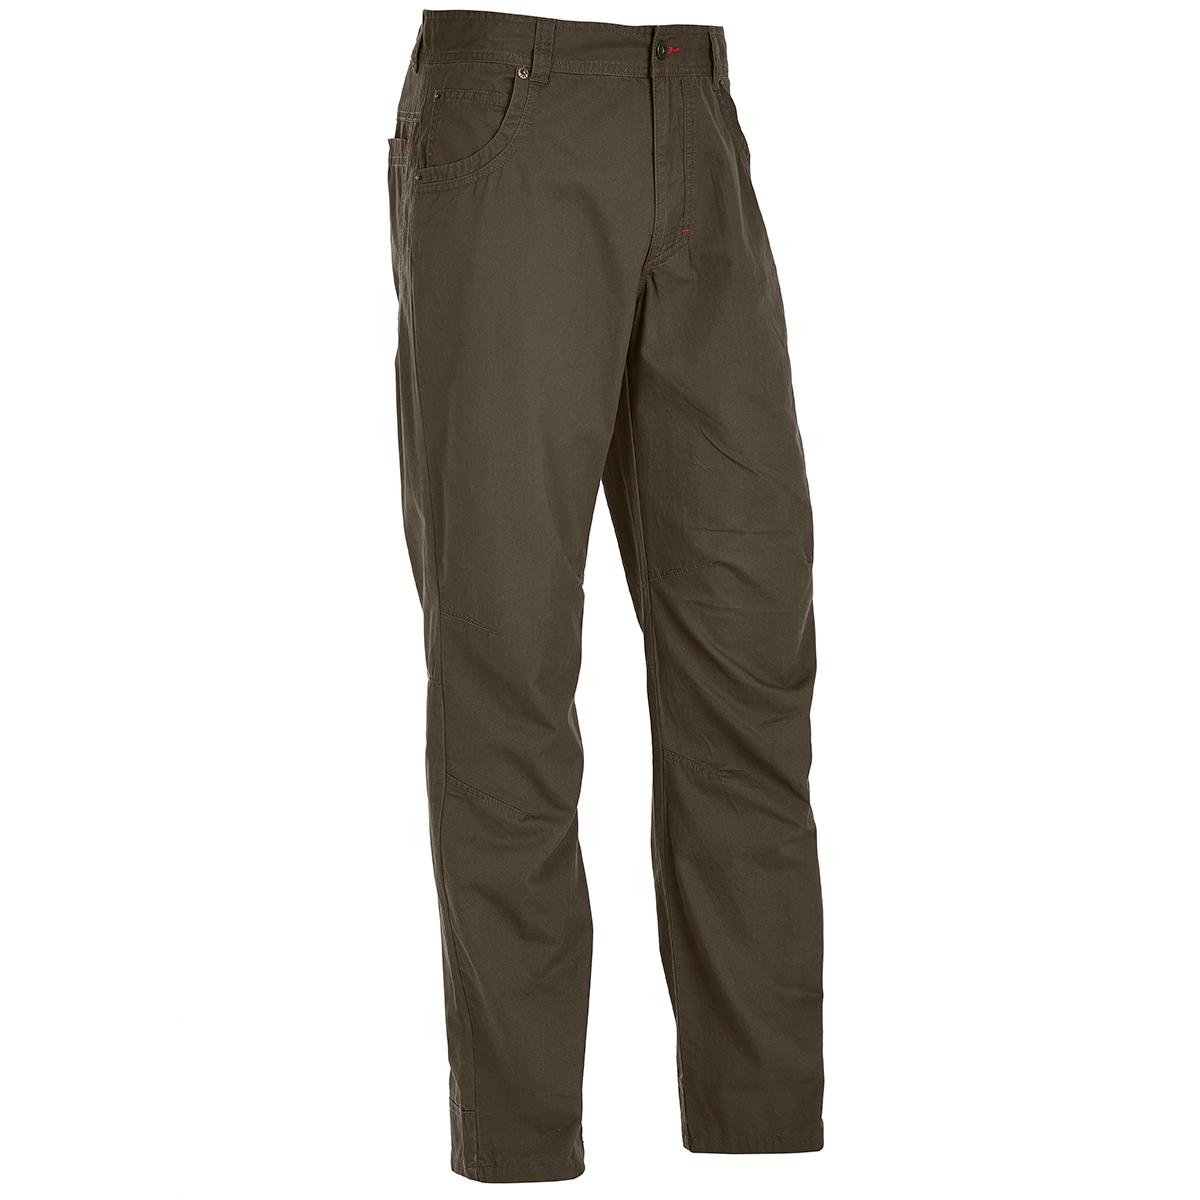 Ems Men's Rohne Lean Pants - Green, 32/30